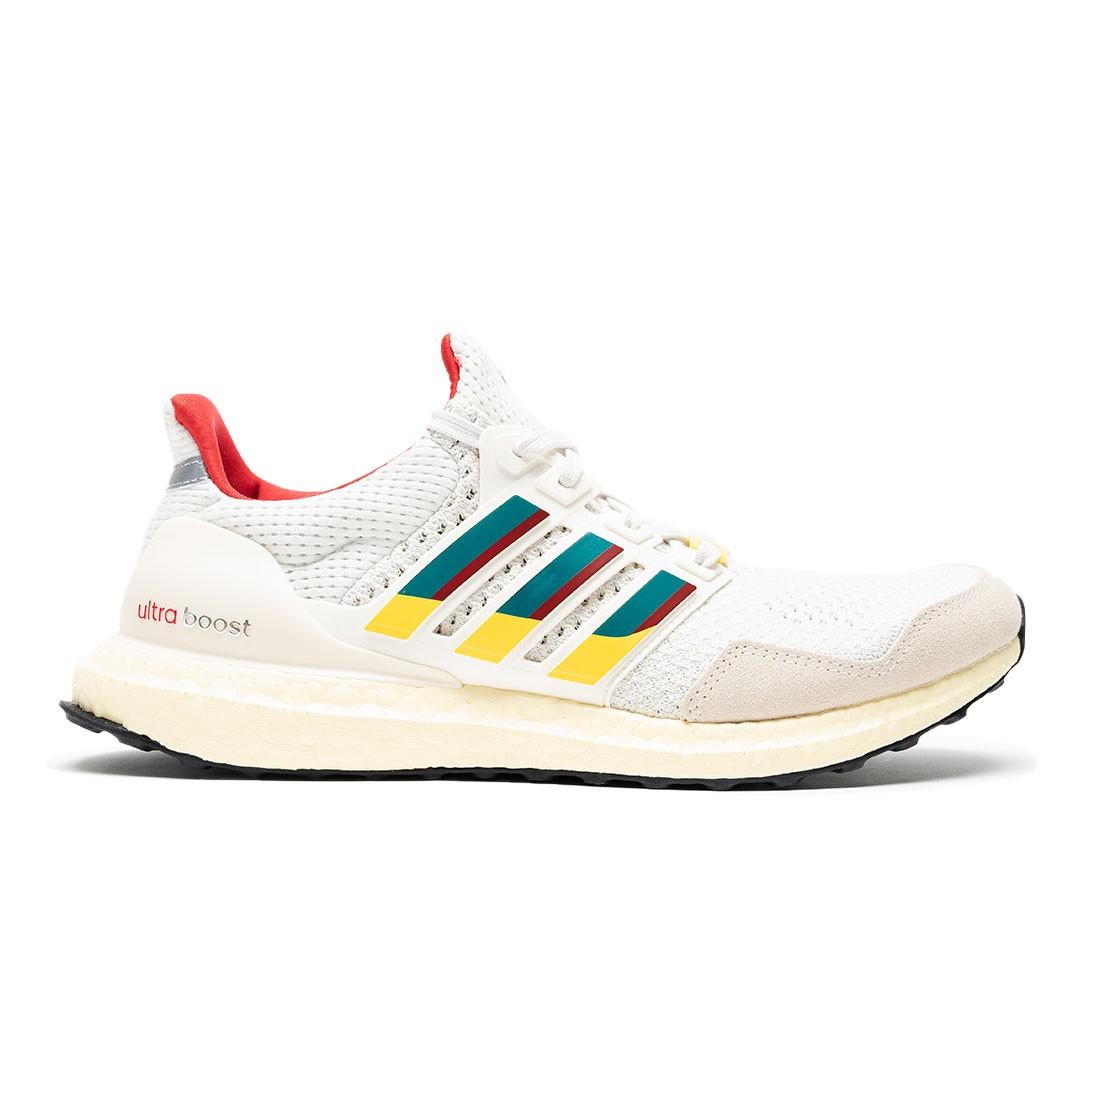 Adidas Men UltraBoost 1.0 DNA (white / eqt green / scarlet)